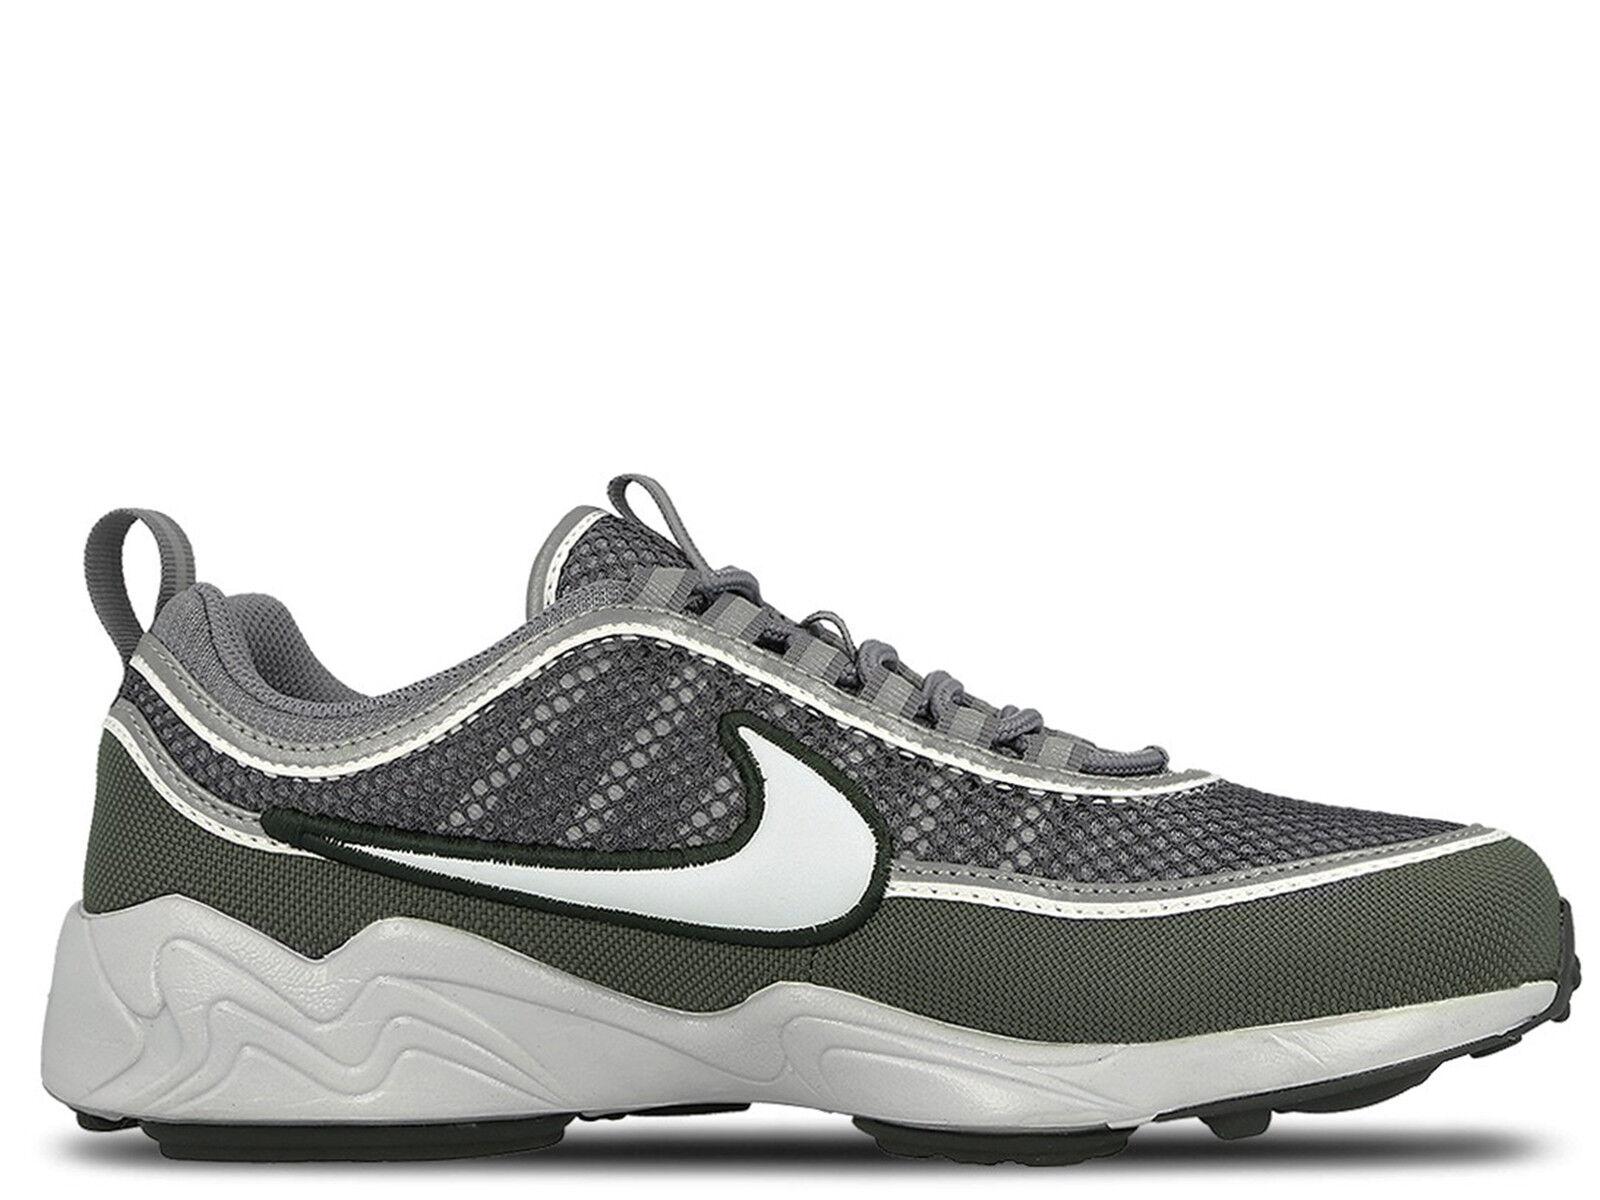 Mens Brand New Nike Air Zoom Spiridon '16 Athletic Fashion Sneakers